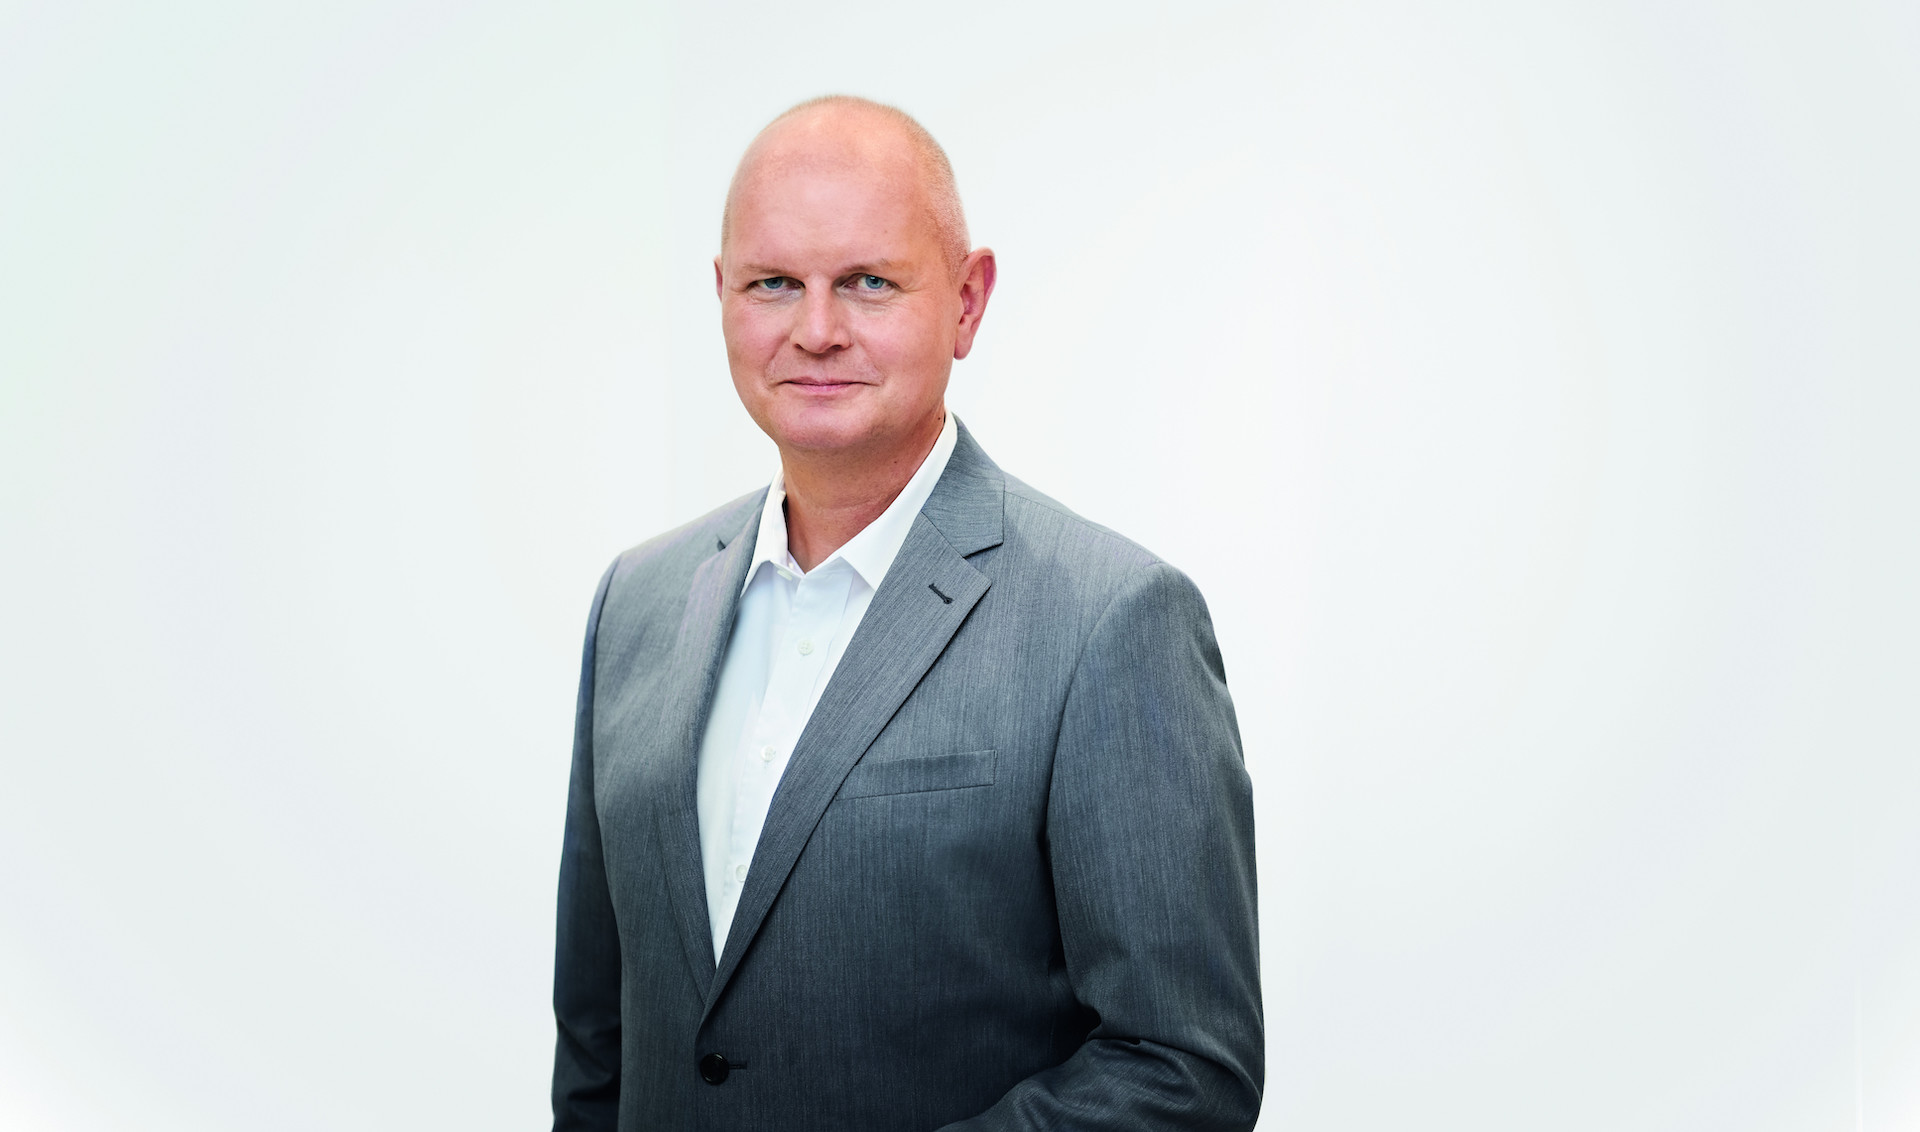 Olaf Koch, generální ředitel Metro AG